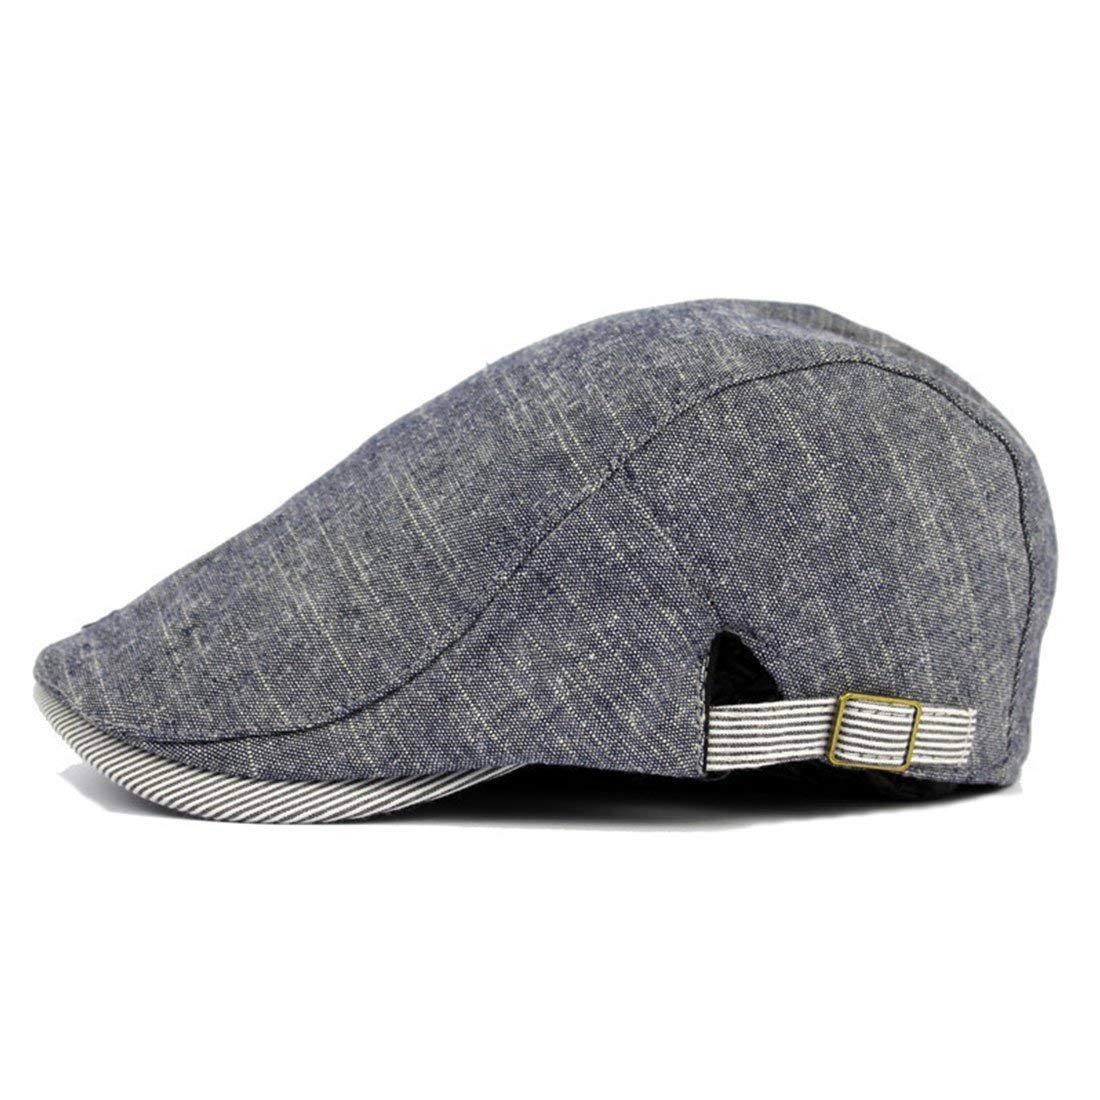 bd8be25654d Get Quotations · Simigree Mans Womens Cotton Flat newsboy Beret IVY Caps  Classic Tweed Retro Cabbie Hat